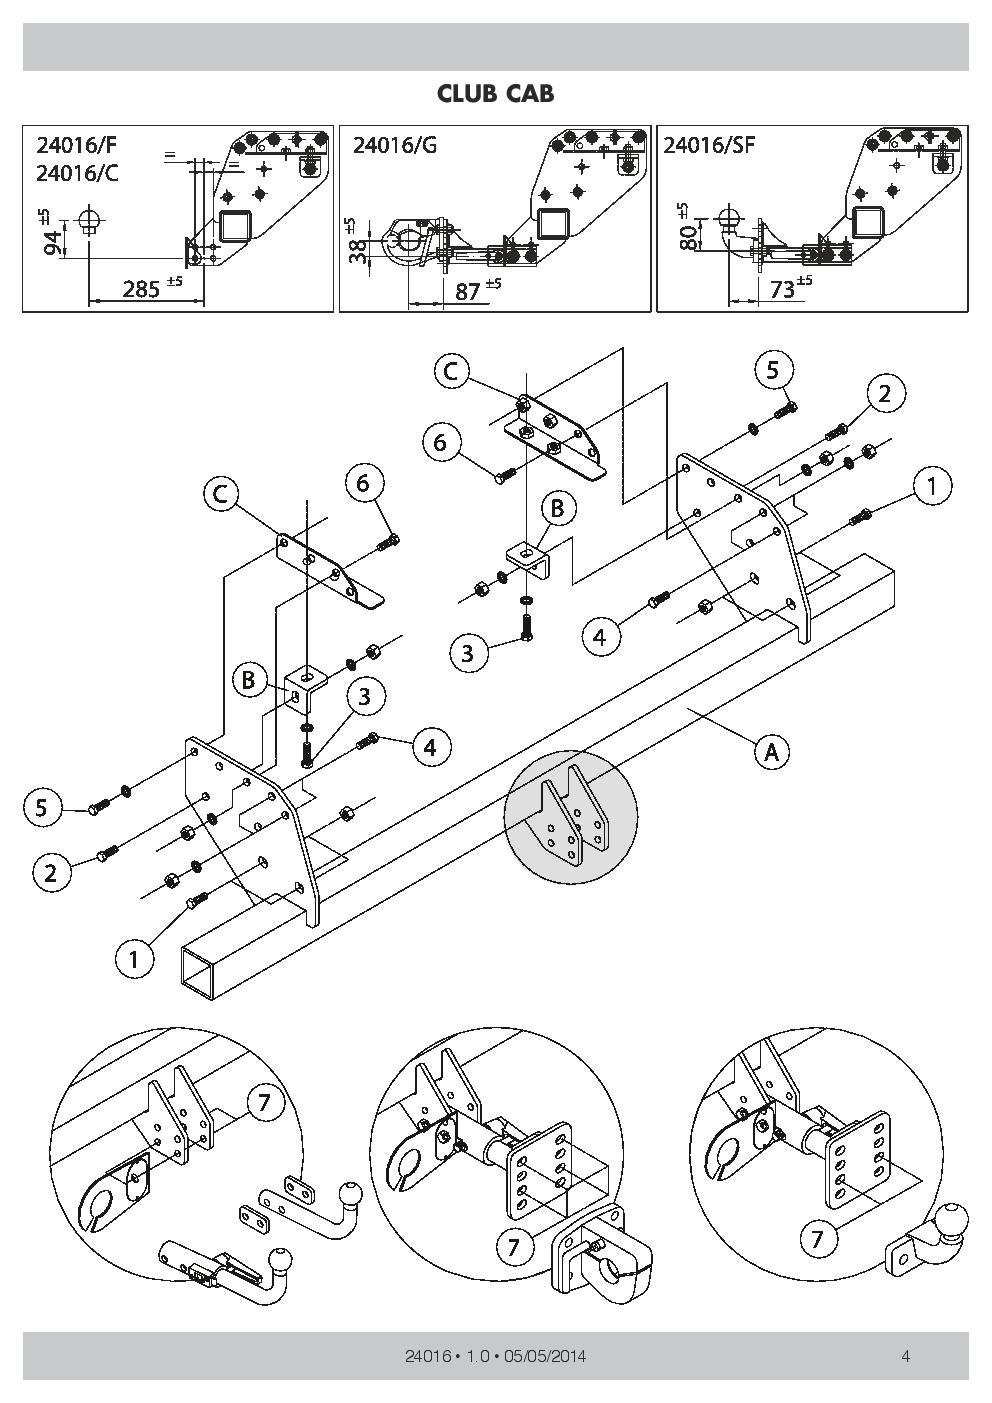 Detachable Towbar 7pin Wiring for Honda Jazz Hatchback 5 doors 08-16 15015//C/_E1